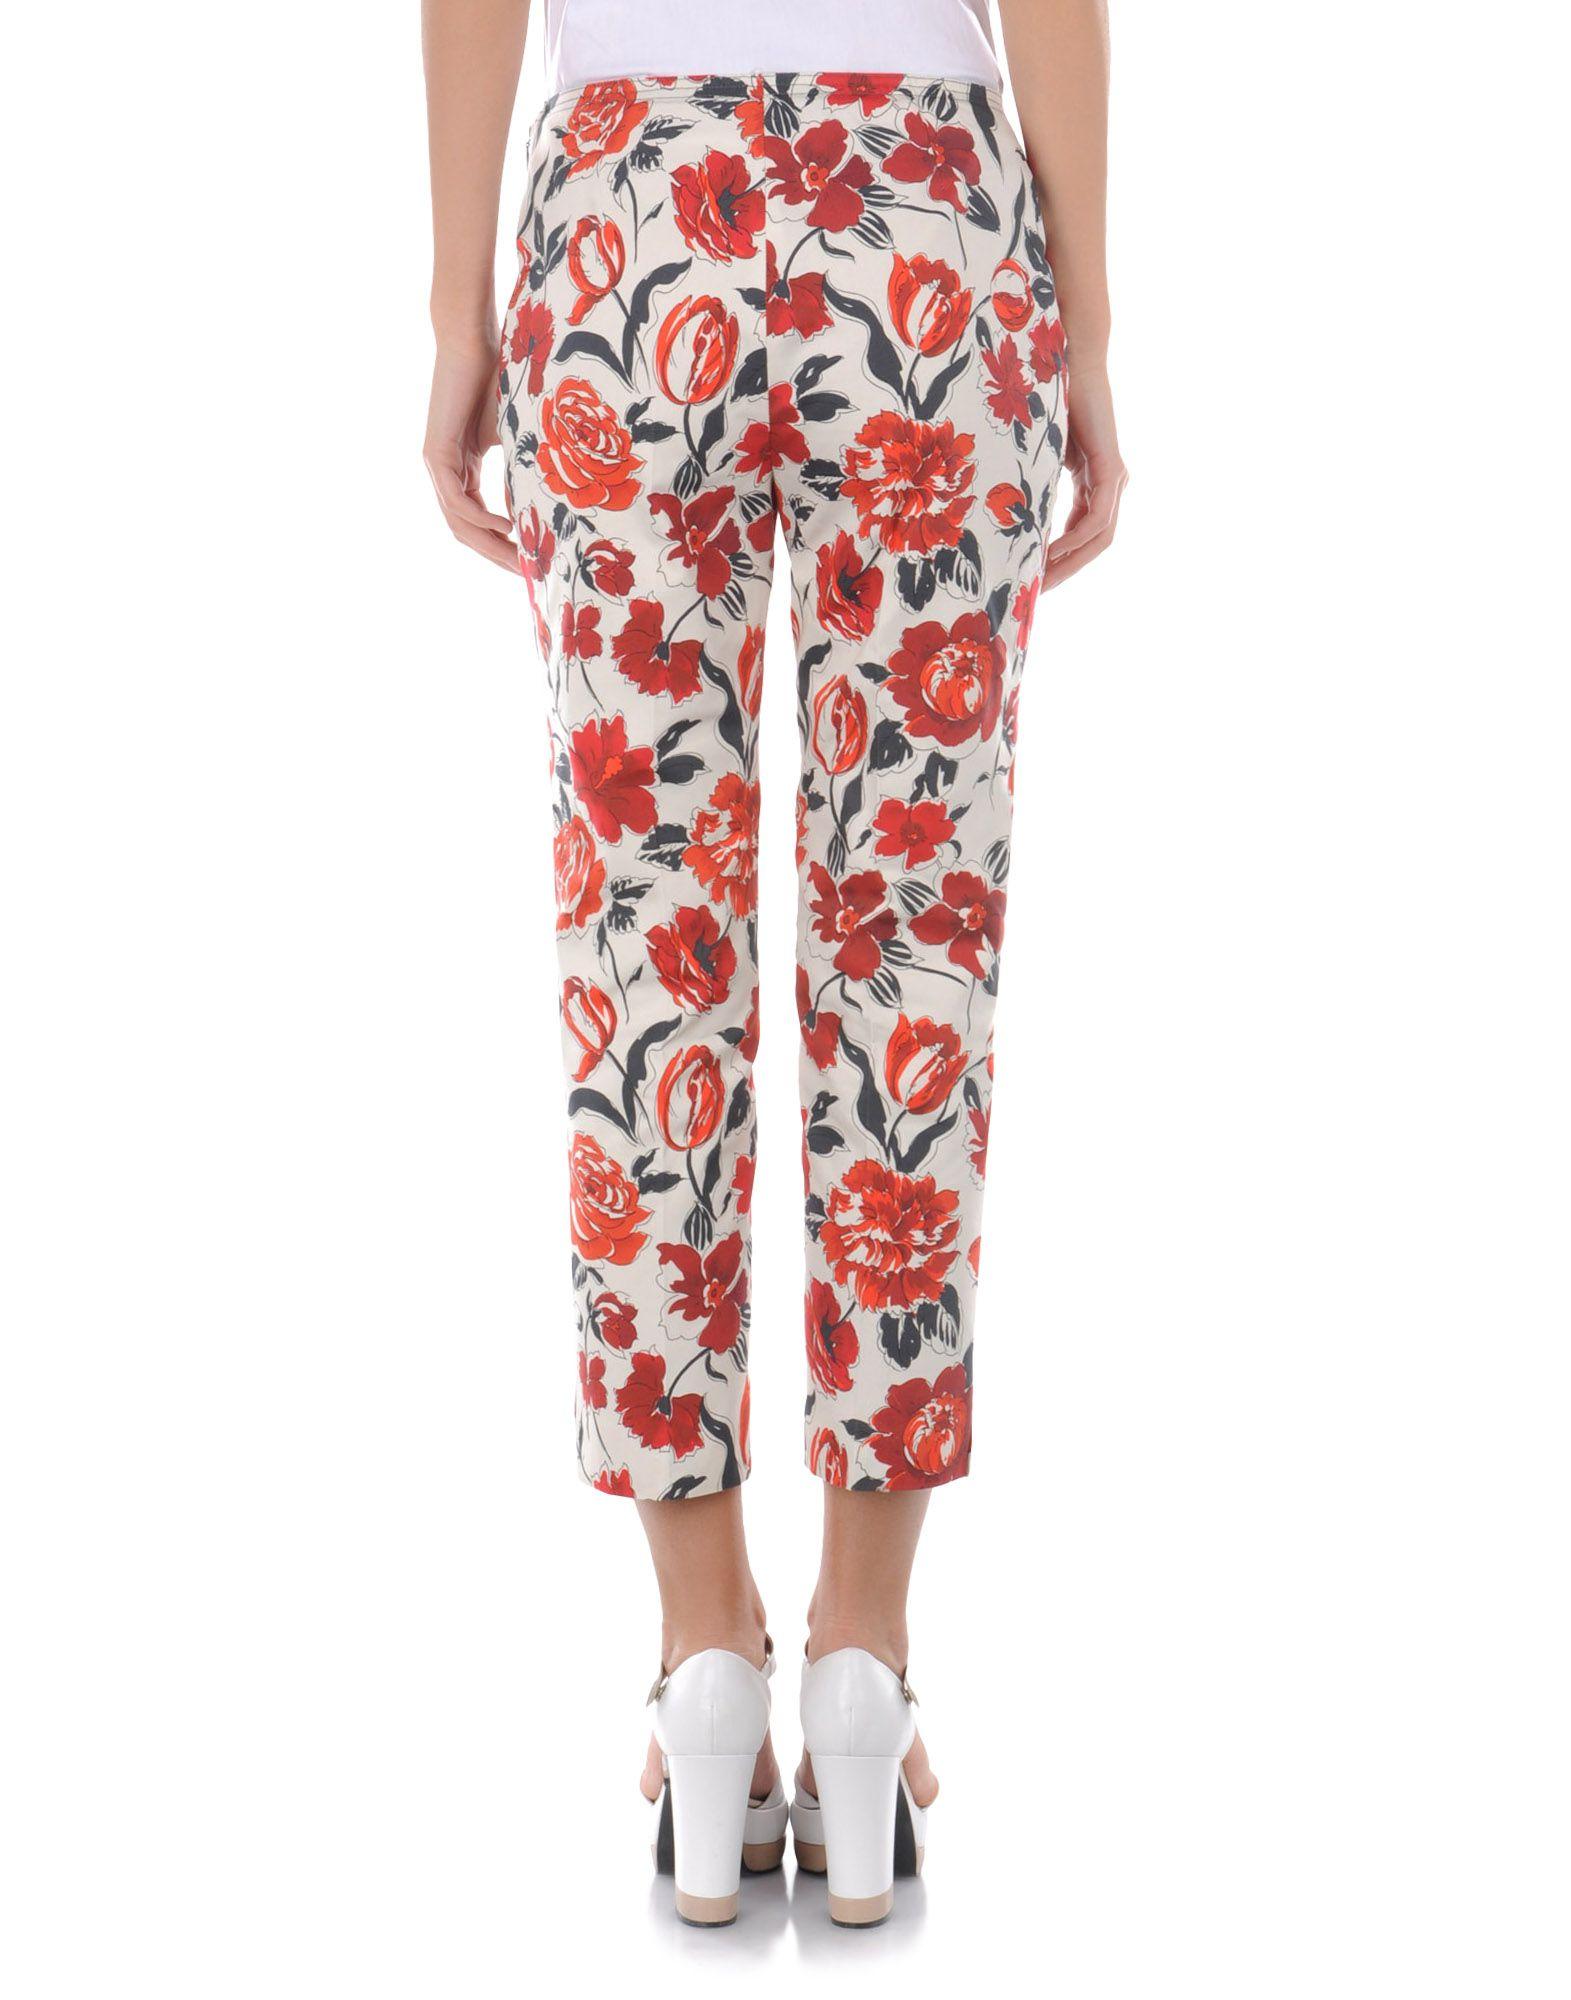 Cropped Pants - JIL SANDER NAVY Online Store